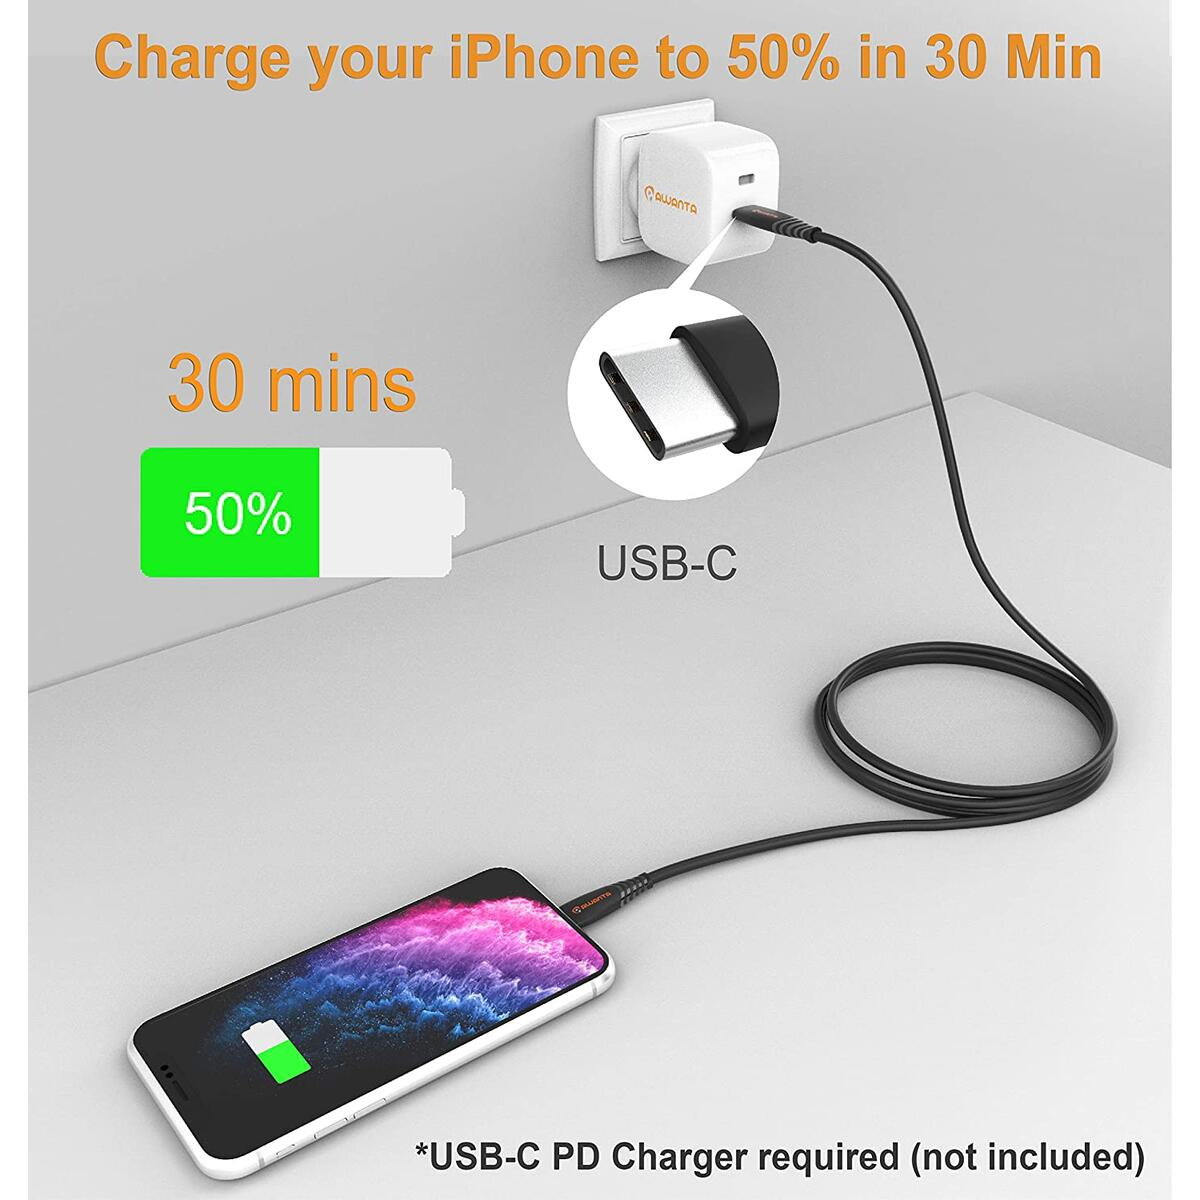 AWANTA USB C to Lightning Cable